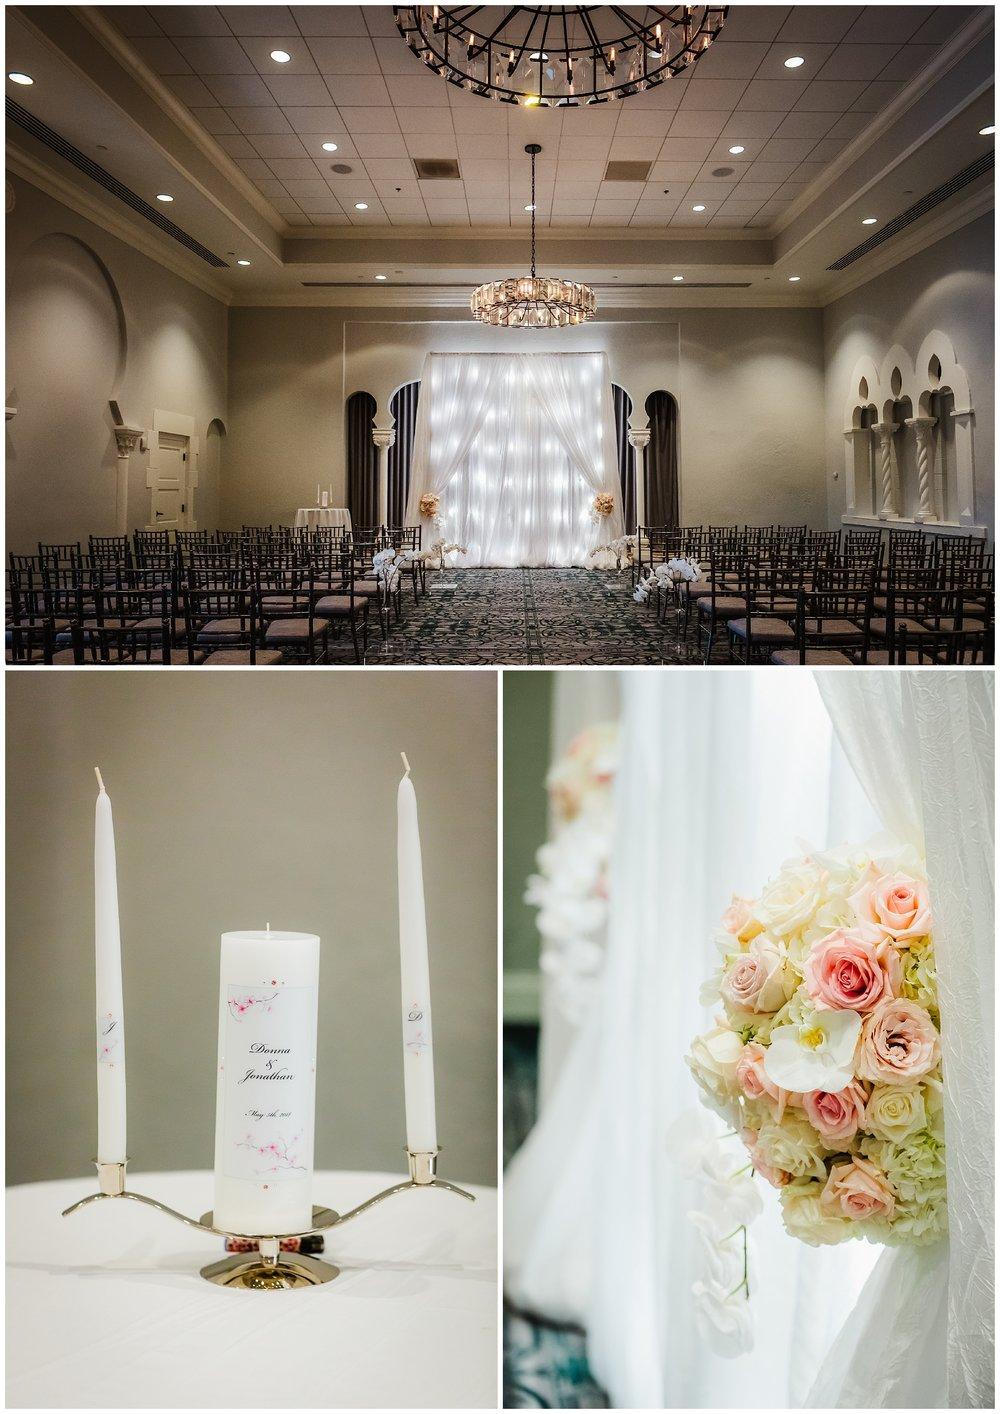 vinoy-sunset-ballroom-rainy-day-wedding-photography-orchids-trinidad-flawless-fetes-ashlee-hamon_0120.jpg